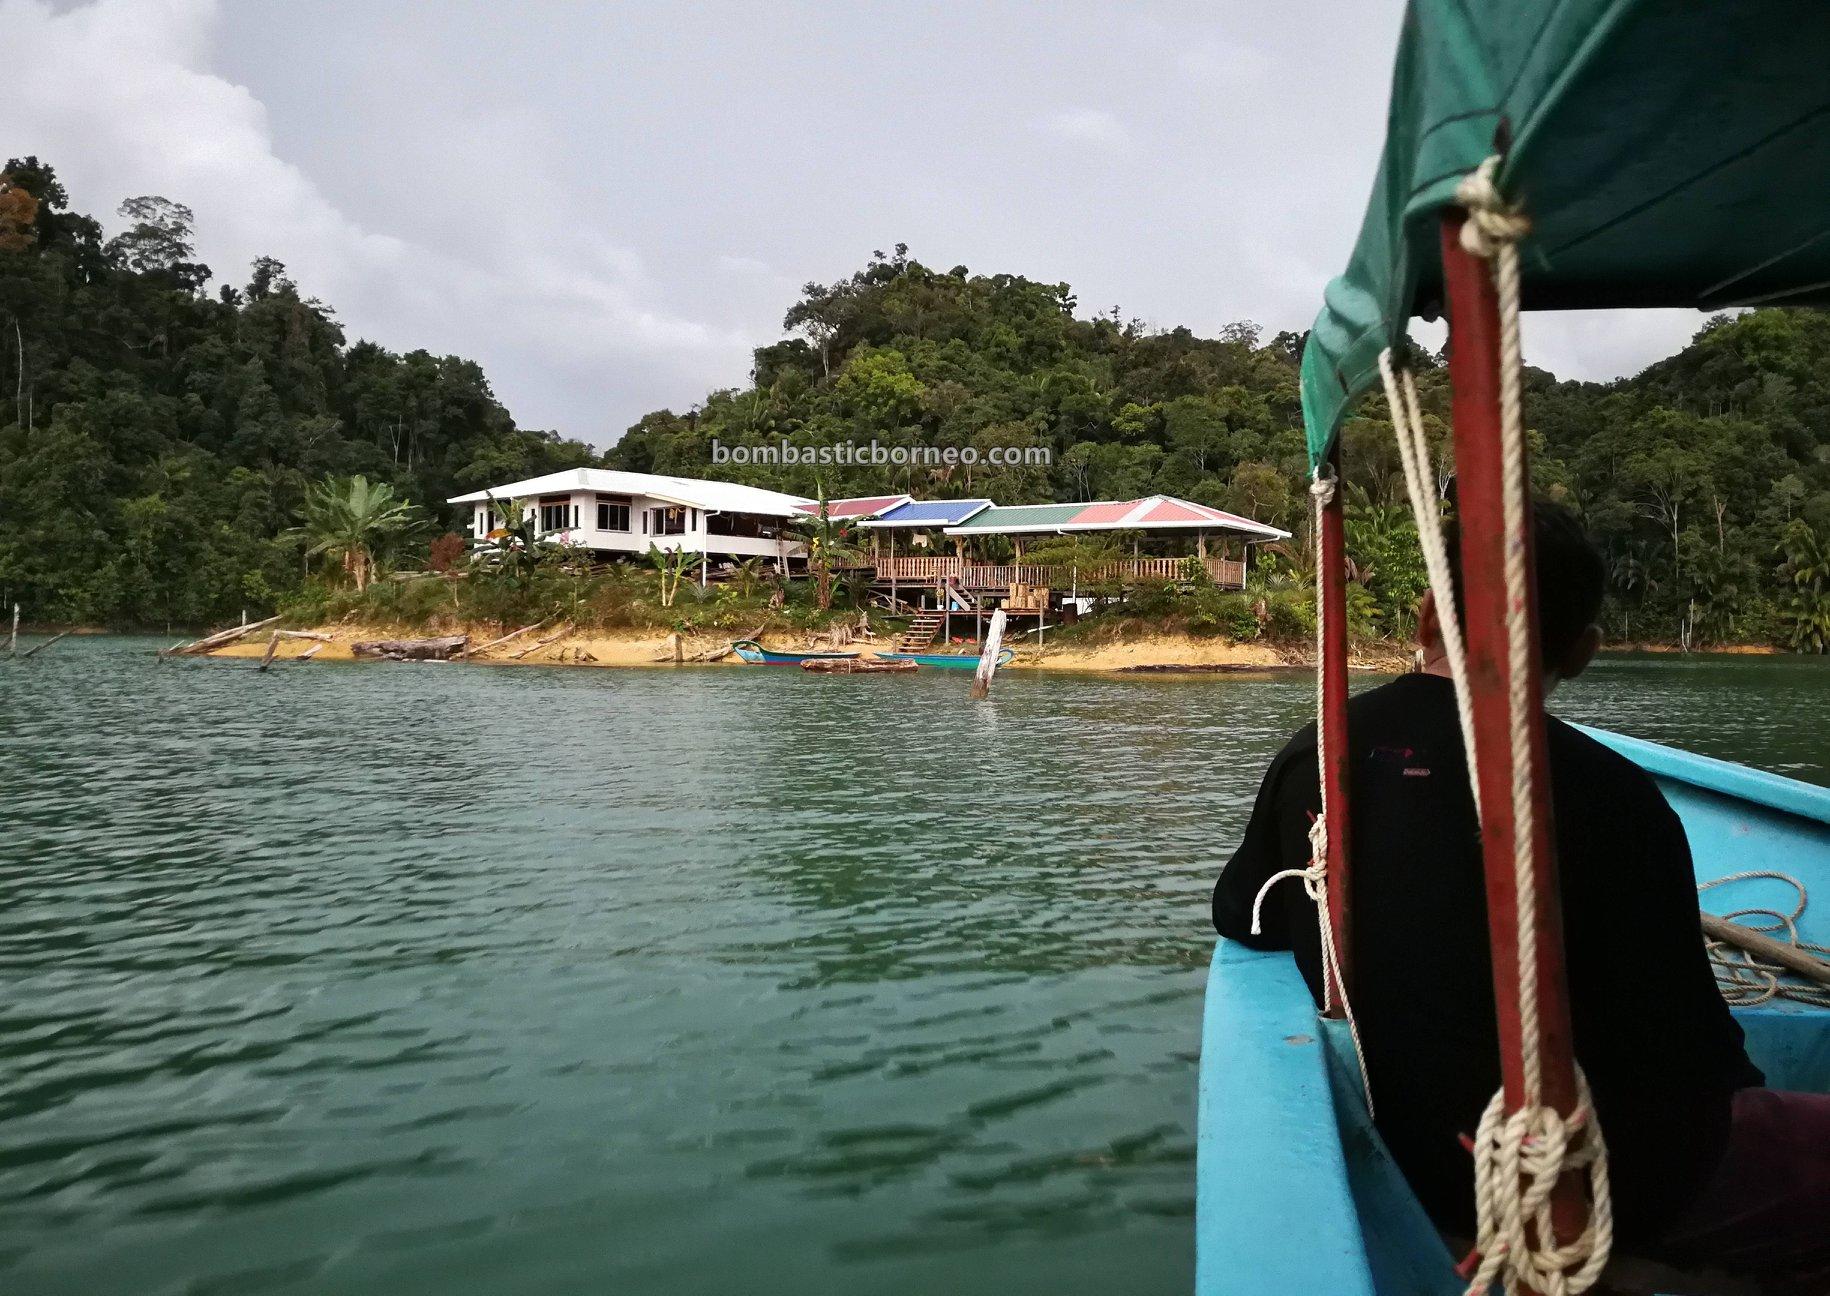 Belaga, Kapit, backpackers, destination, fishing trip, chalet, homestay, Malaysia, Tourism, tourist attraction, travel guide, Trans Border, 婆罗洲浮屋度假, 砂拉越巴贡水电站, 布拉甲加帛